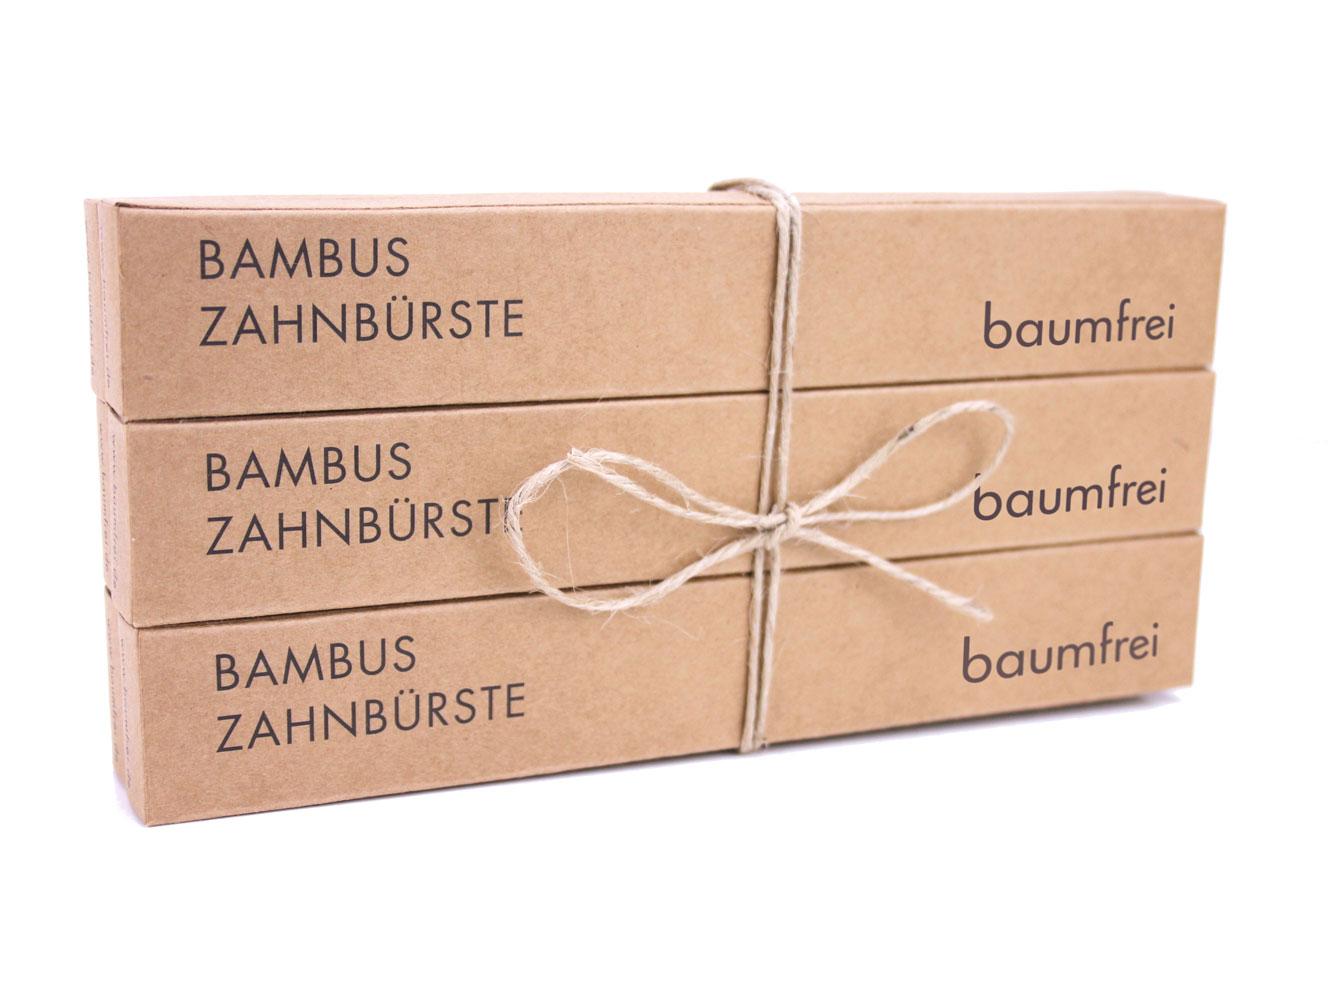 Bambus Zahnburste Vegan Bpa Frei Baumfrei